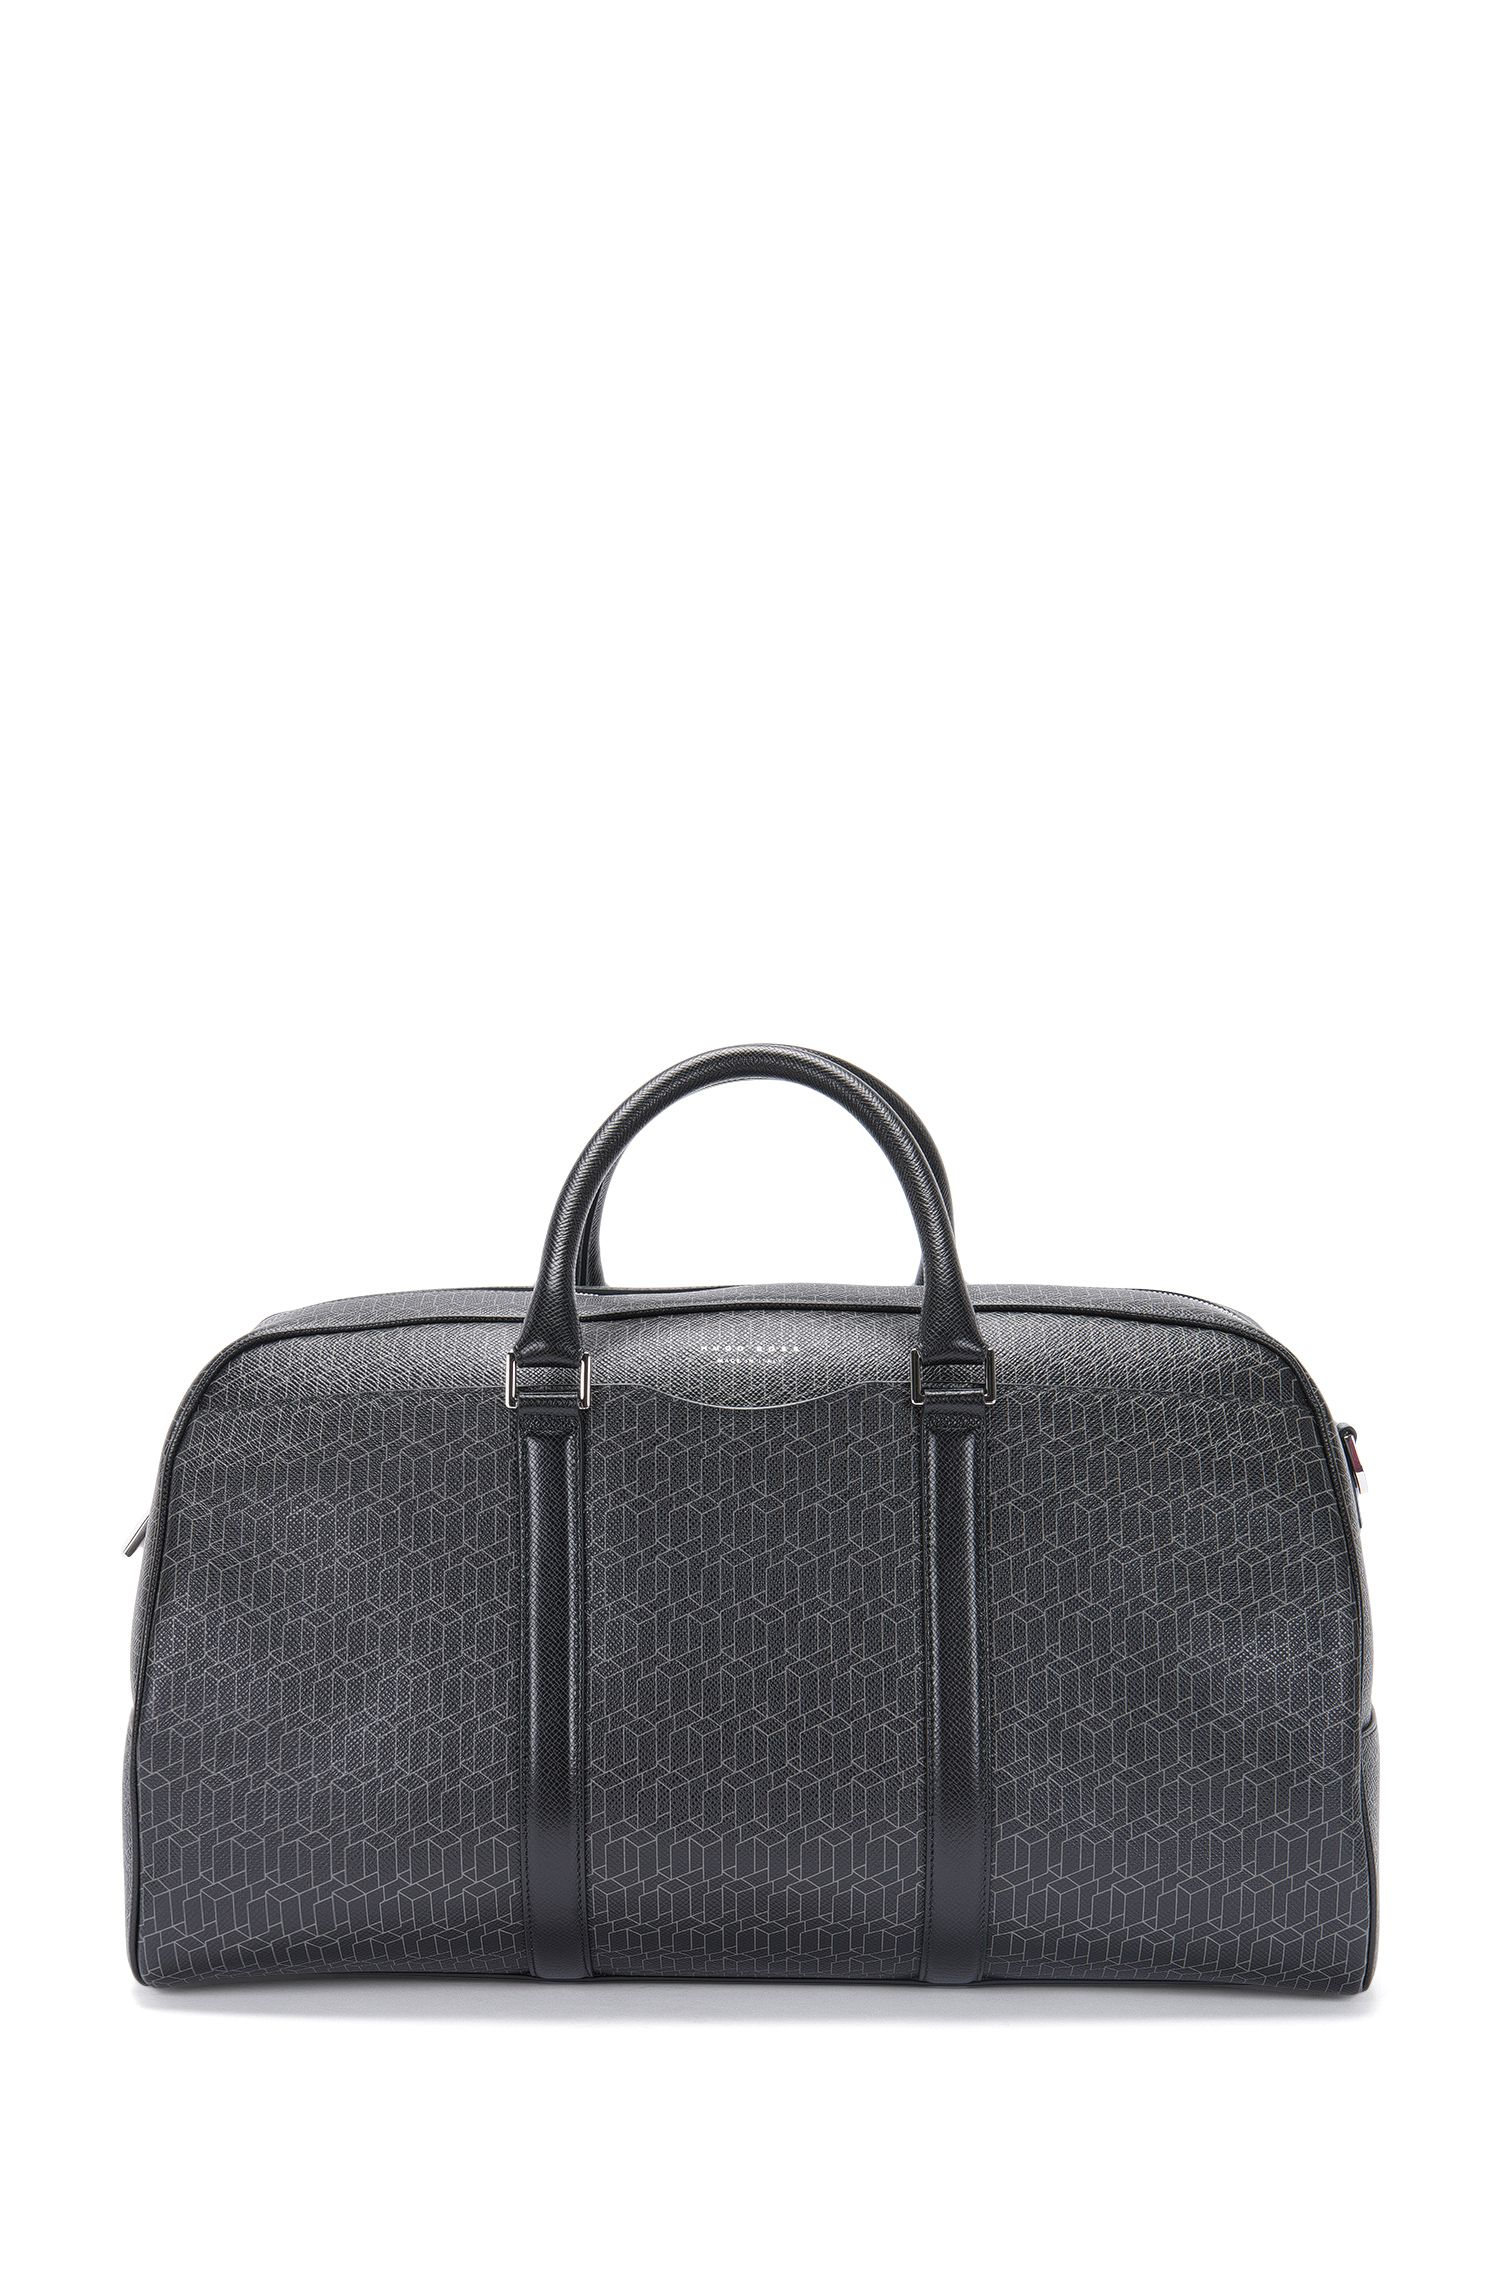 'Signature H Holdall' | Italian Calfskin Printed Embossed Weekender Bag, Detachable Shoulder Strap